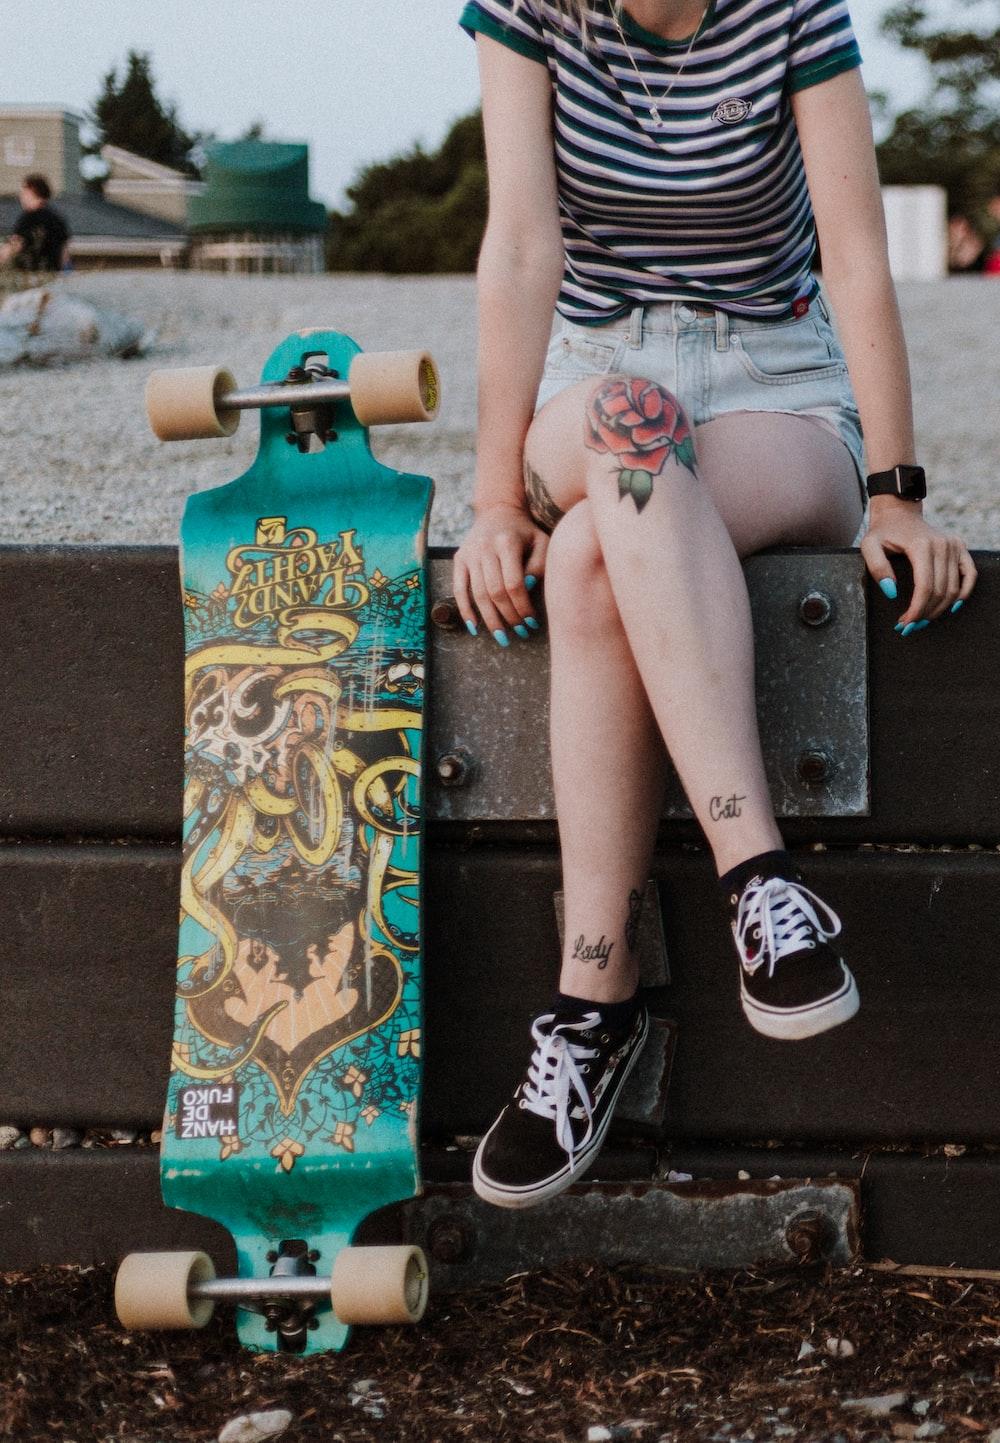 girl wearing green and white stripe shirt sitting besides green longboard